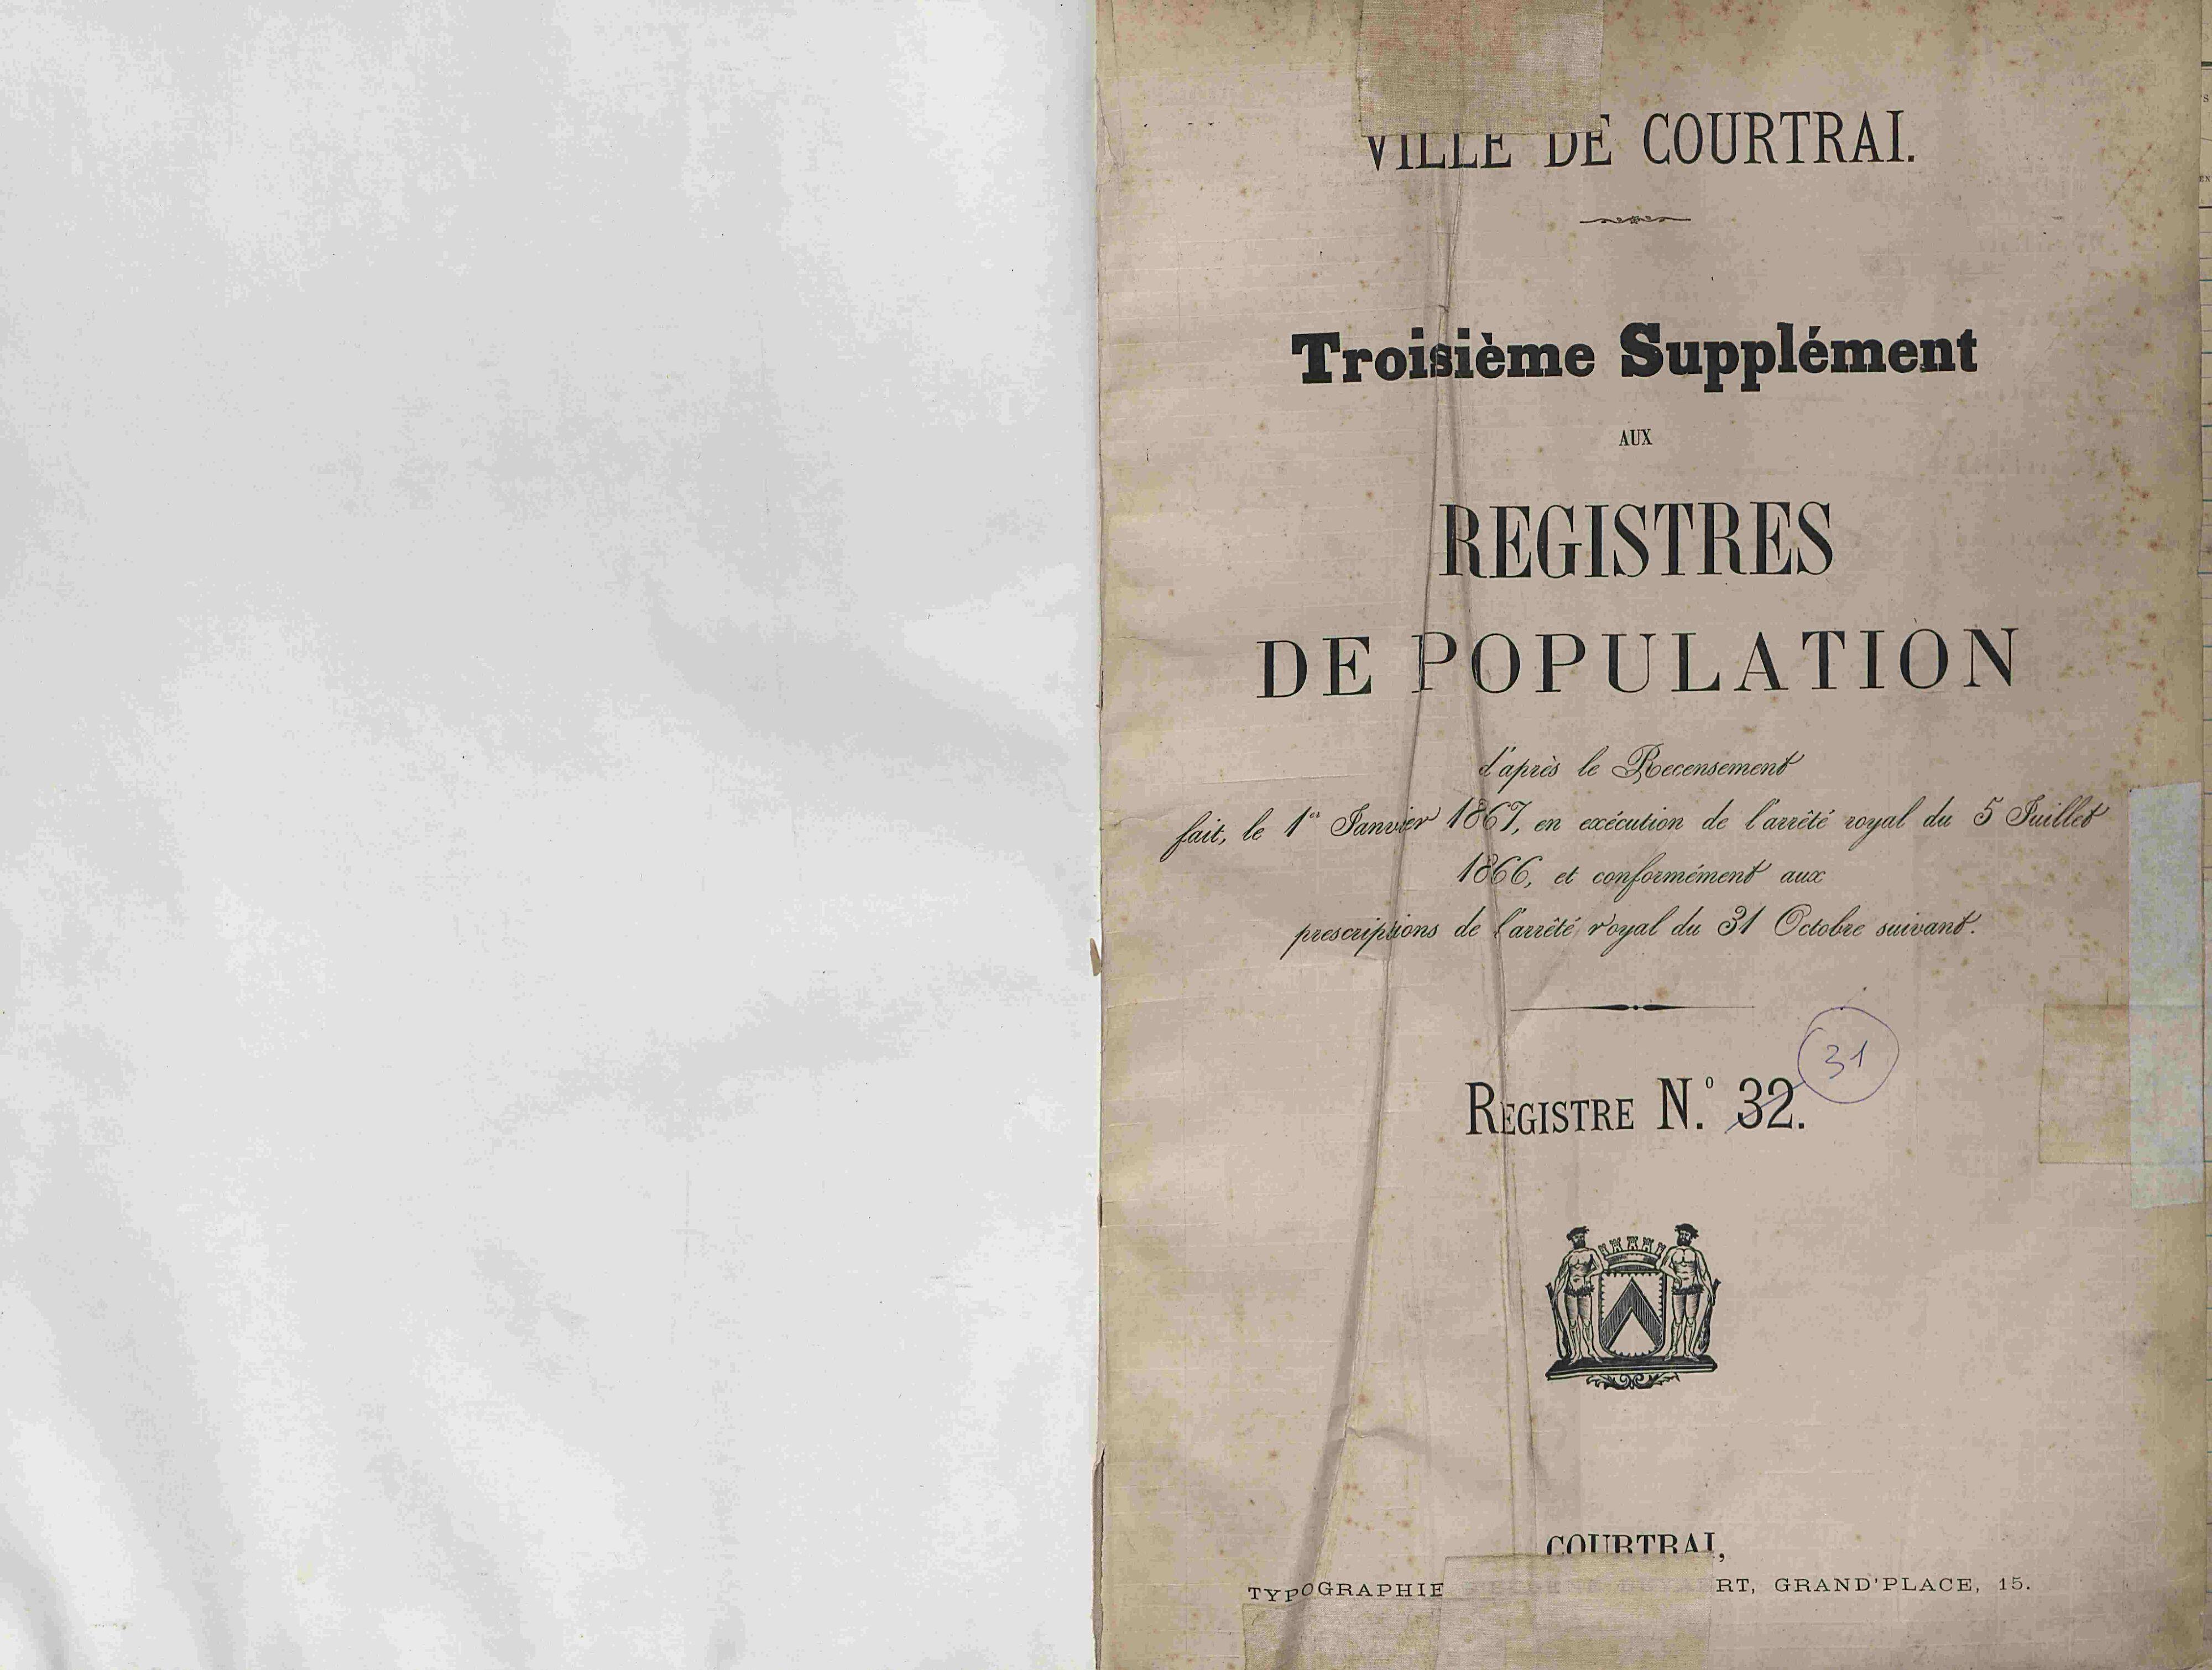 Bevolkingsregister Kortrijk 1866 boek 31